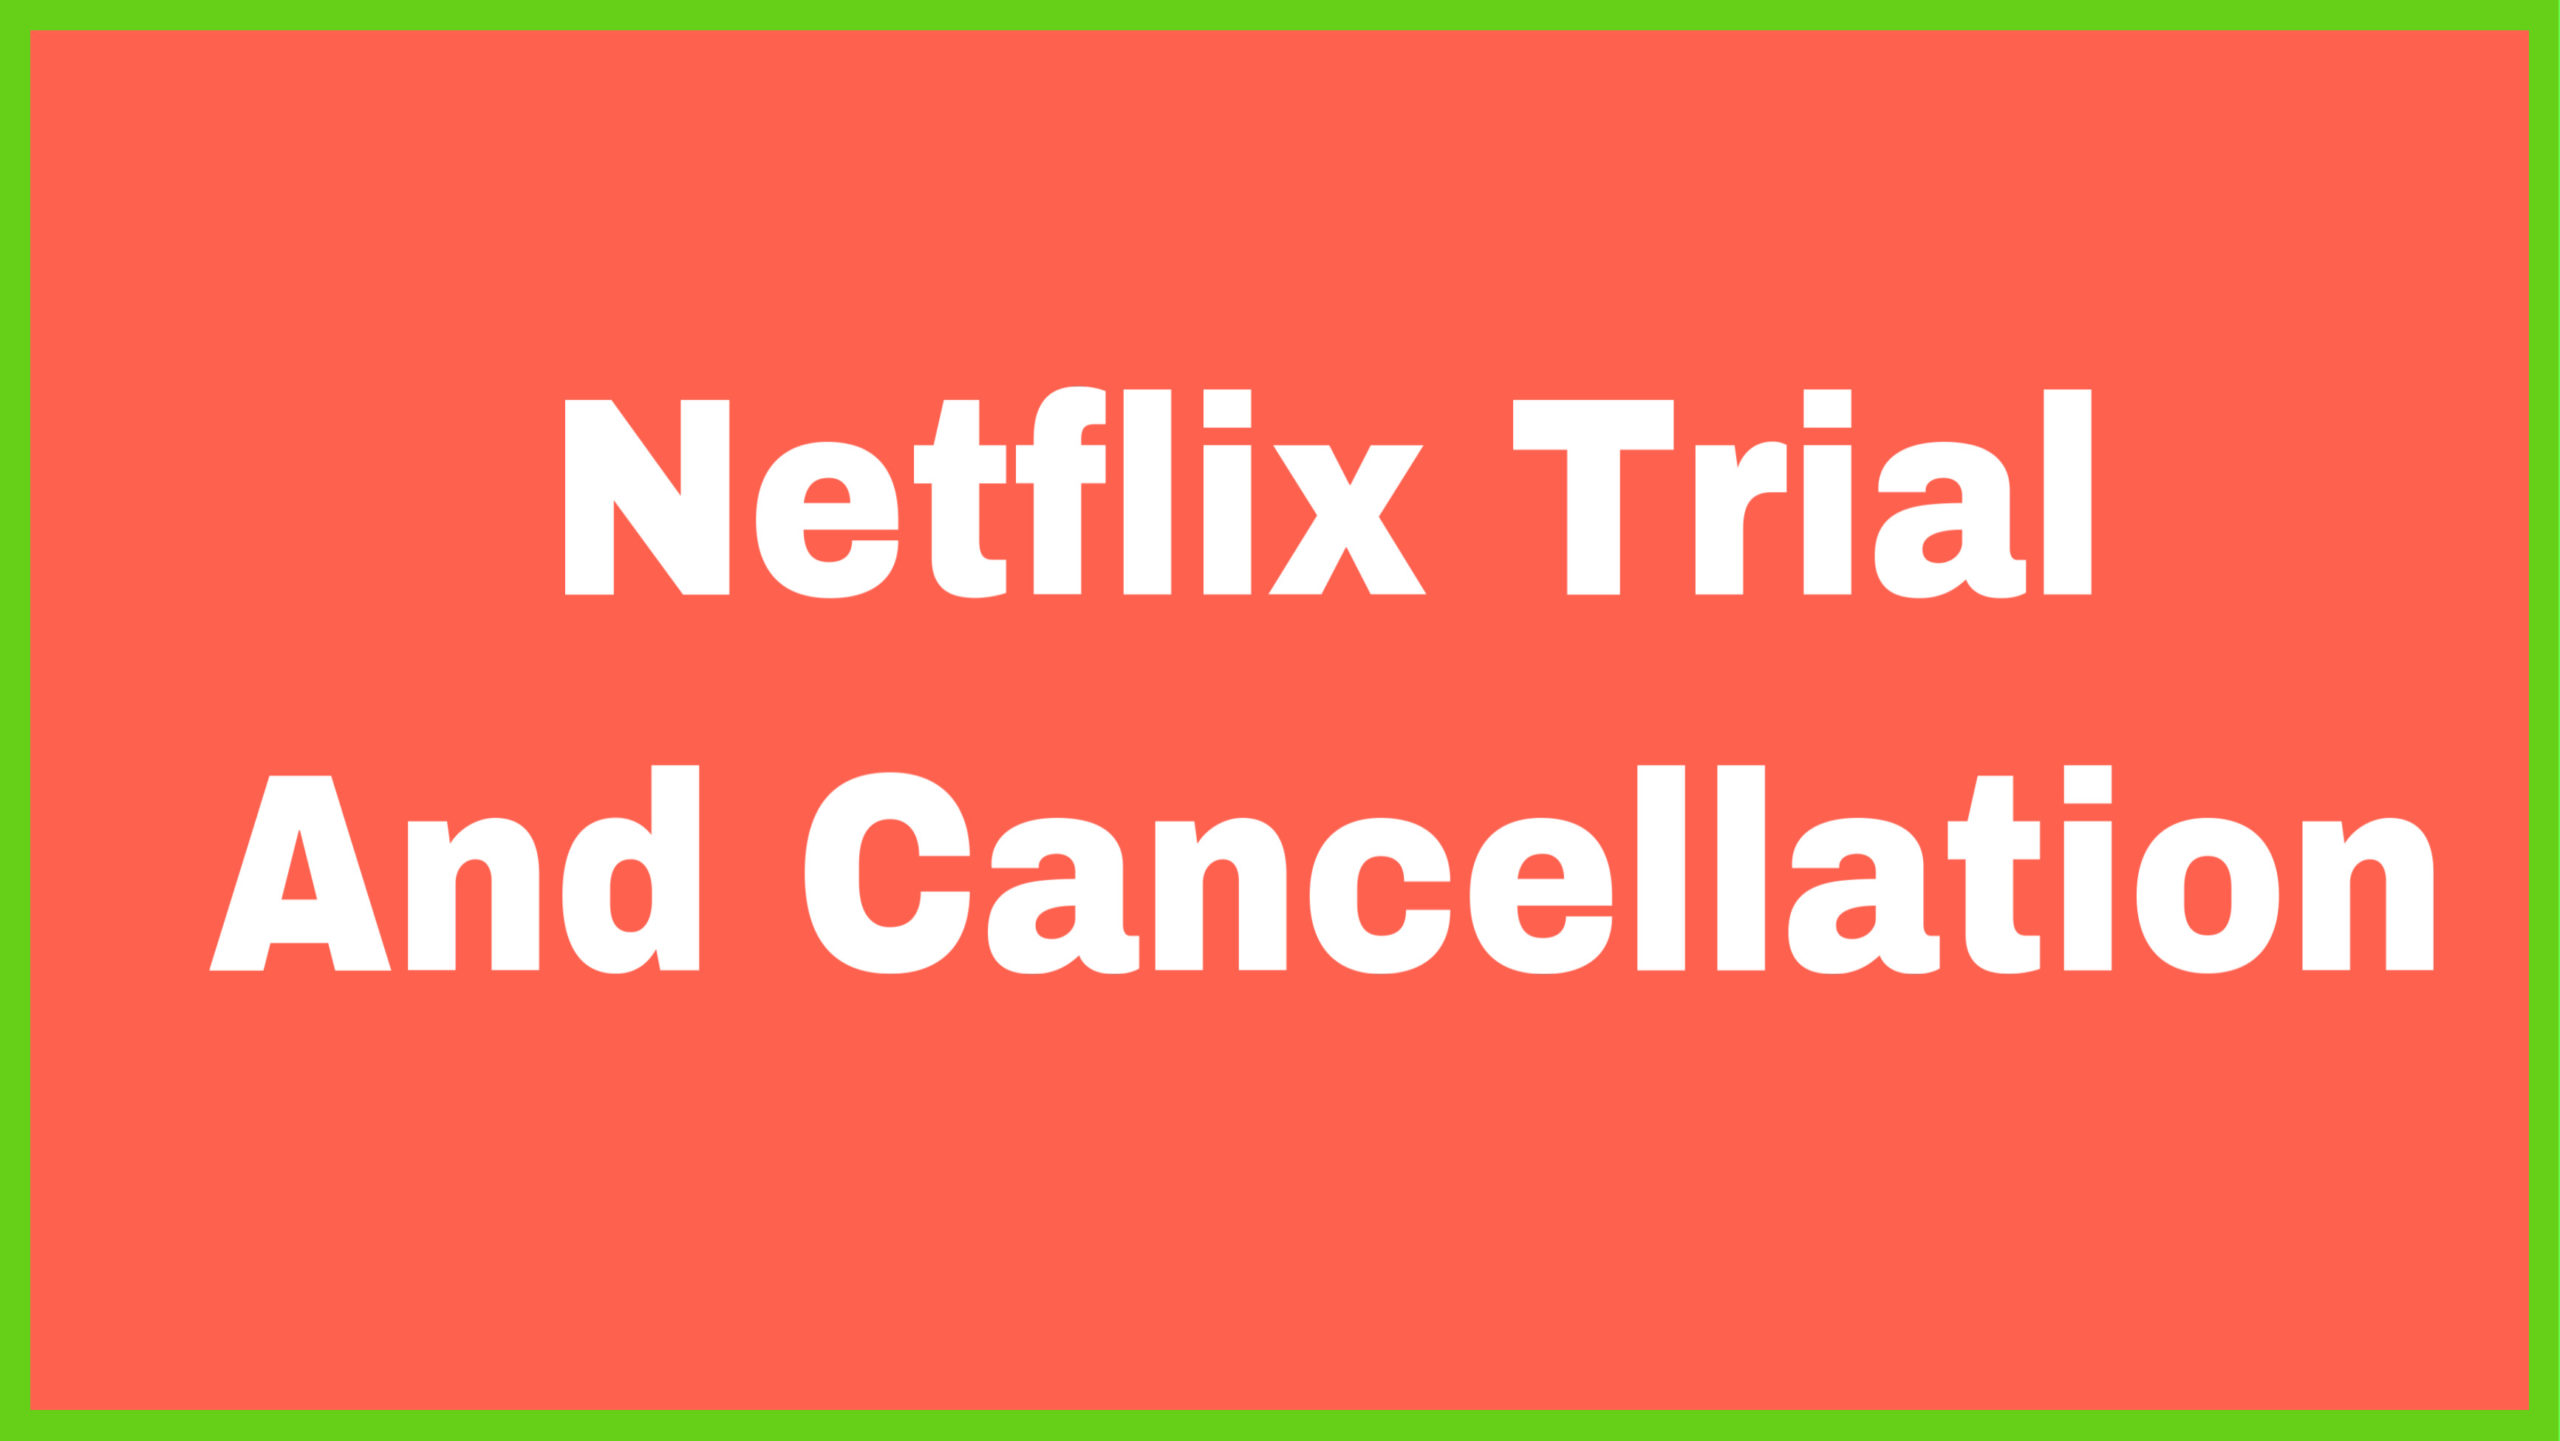 Netflix trial